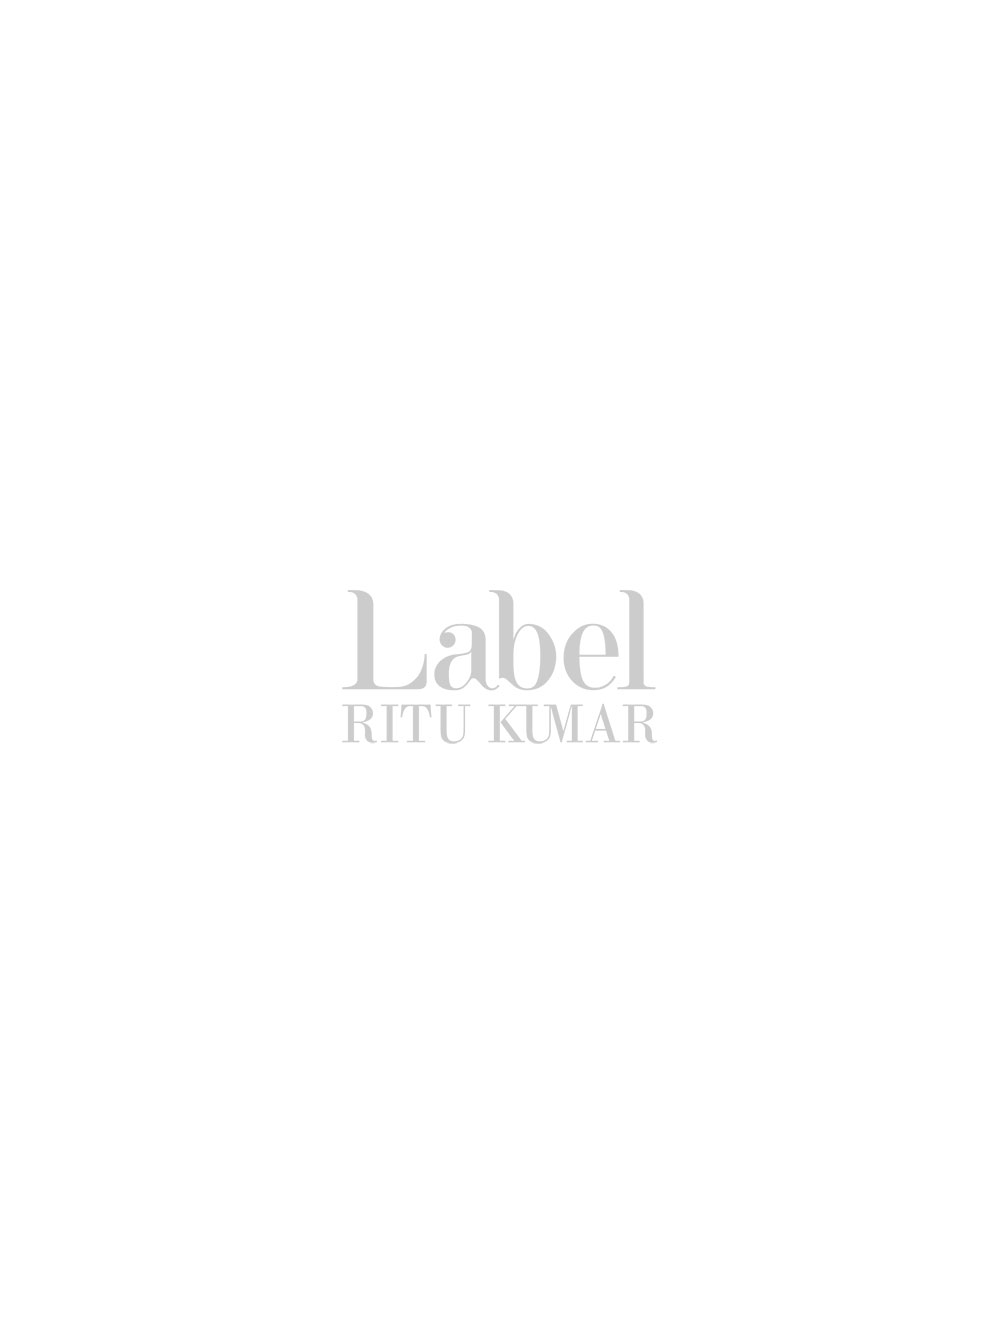 Pink Short Dress In A Signature Ritu Kumar Criss Cross Pattern